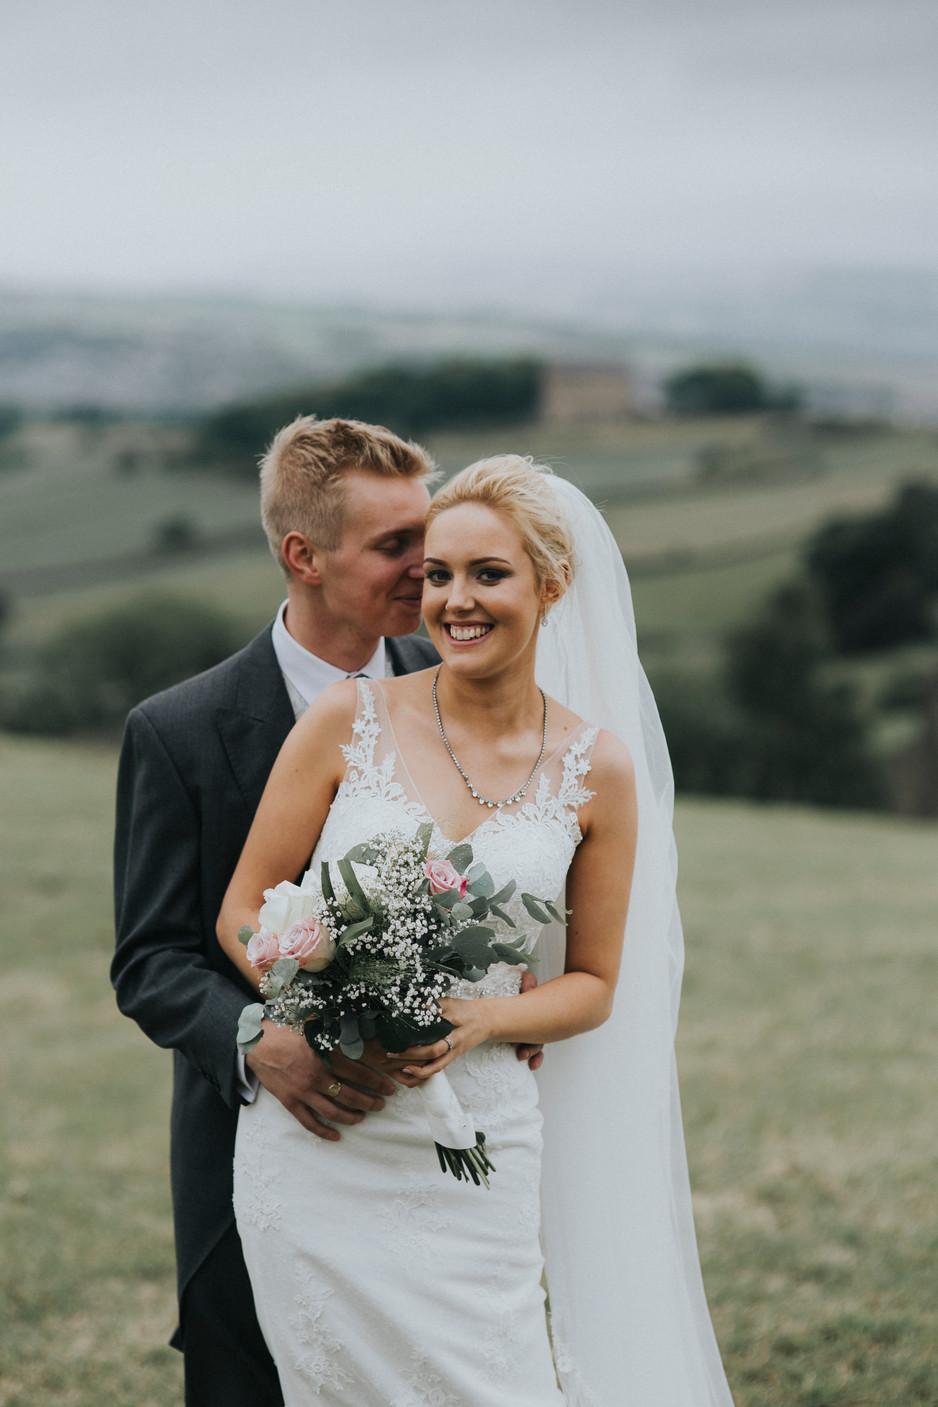 wedding photographer blackley west yorkshire